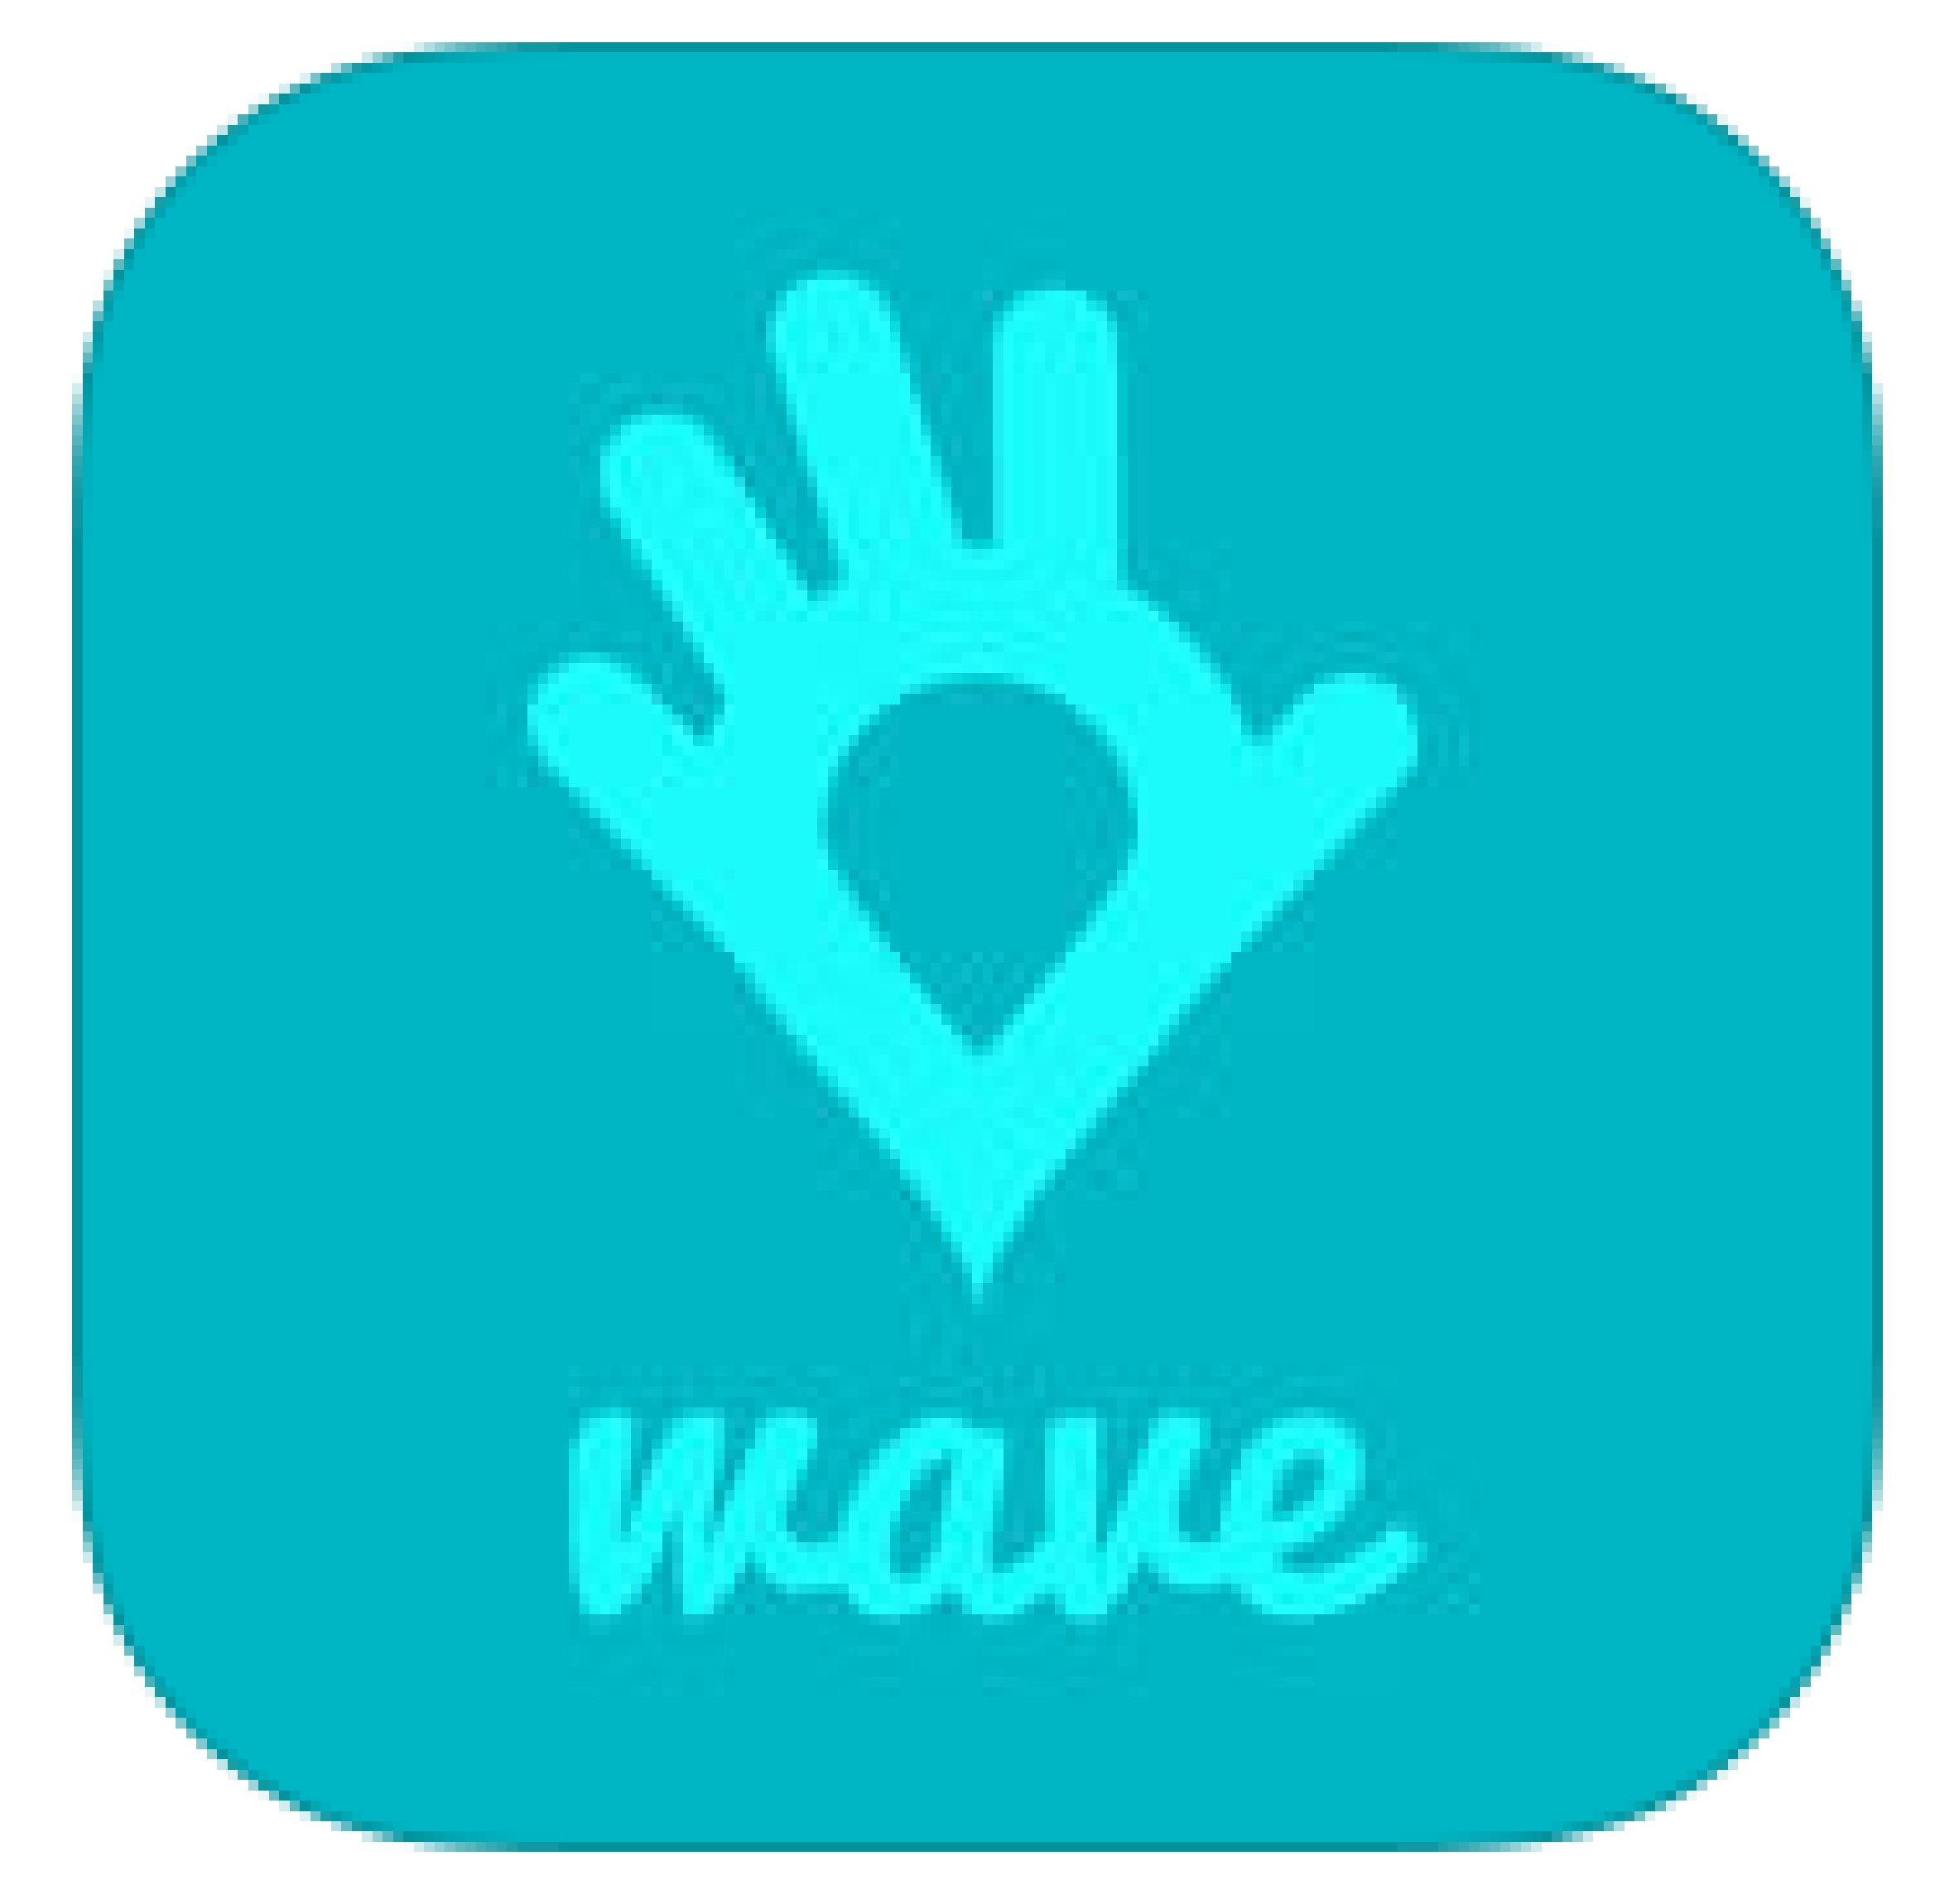 wave-prueba